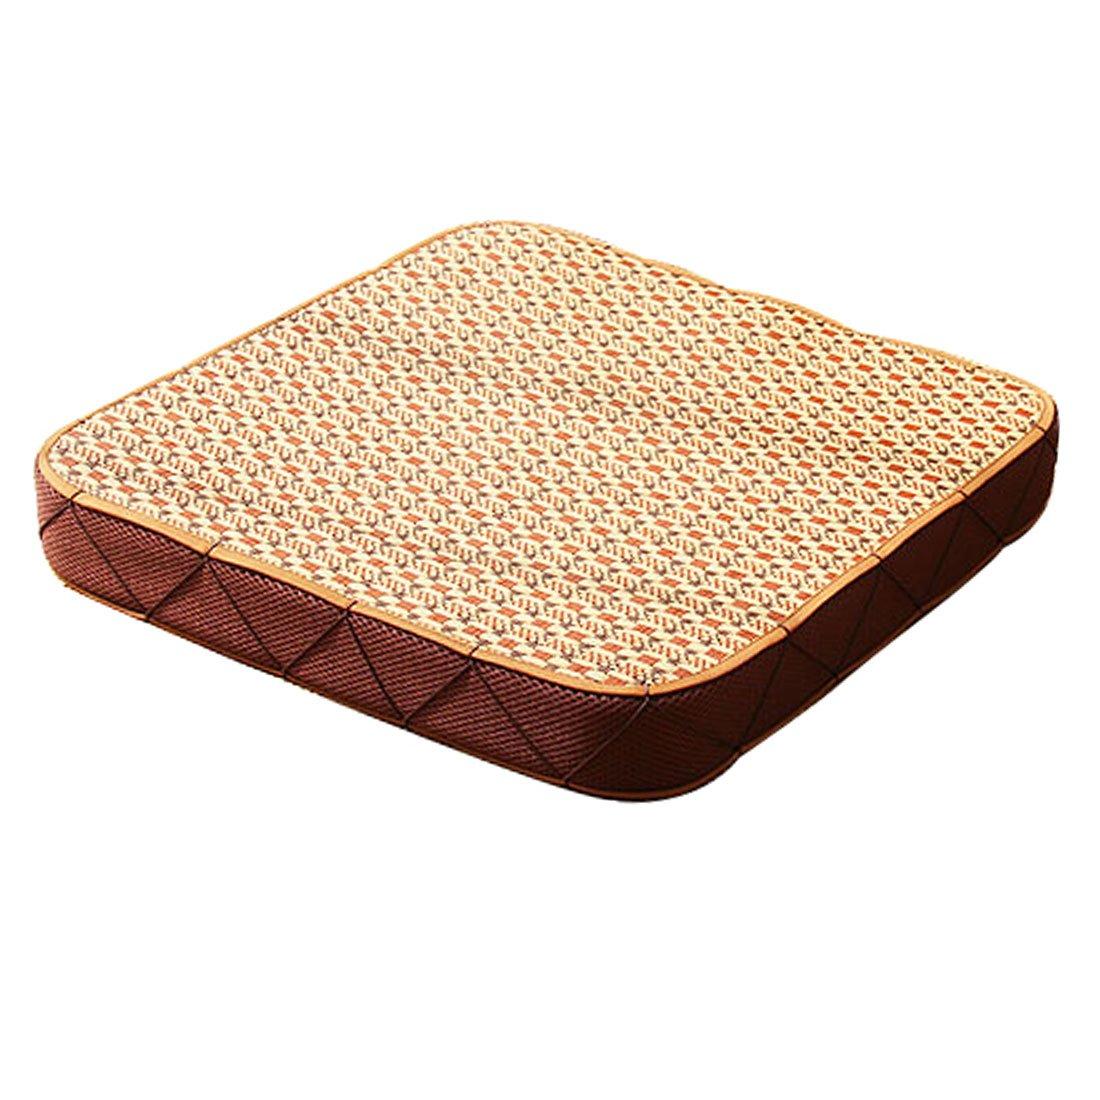 Life808 Floor Pillow Cushion Japanese Futon Square Seat Cushion Thicken Chair Wave Window Pad 11.8x1.6inch